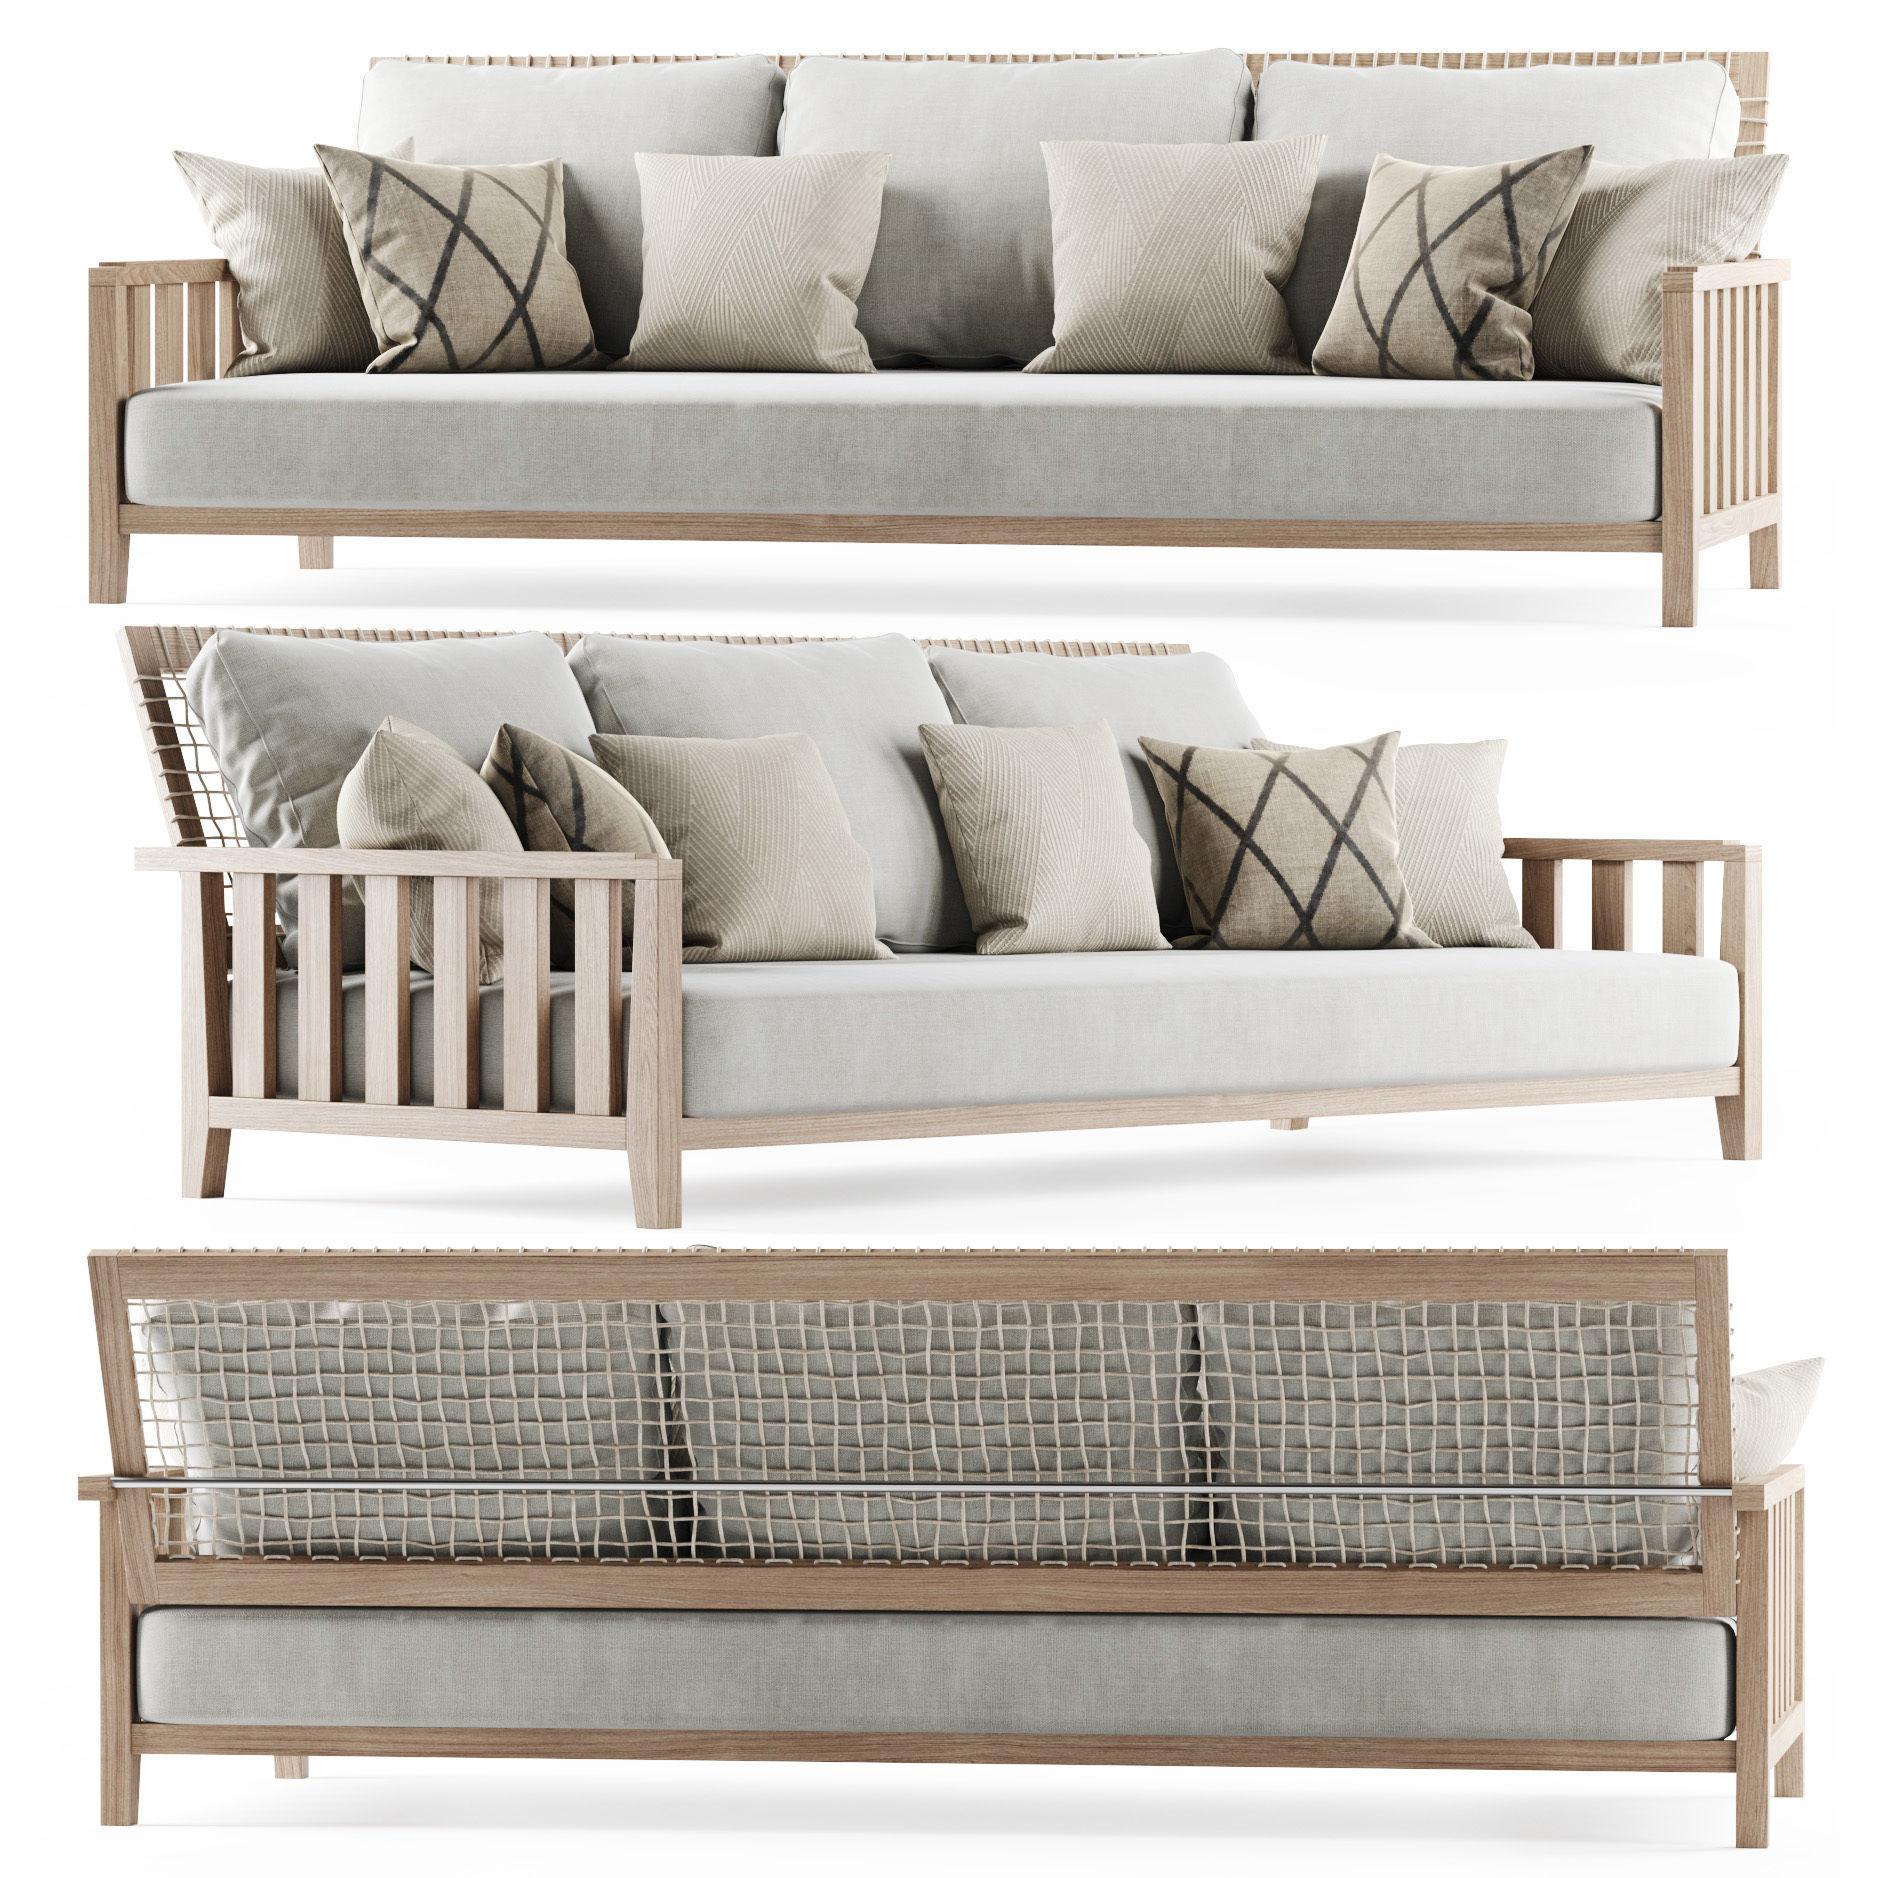 Three-seater garden sofa 3D   CGTrader